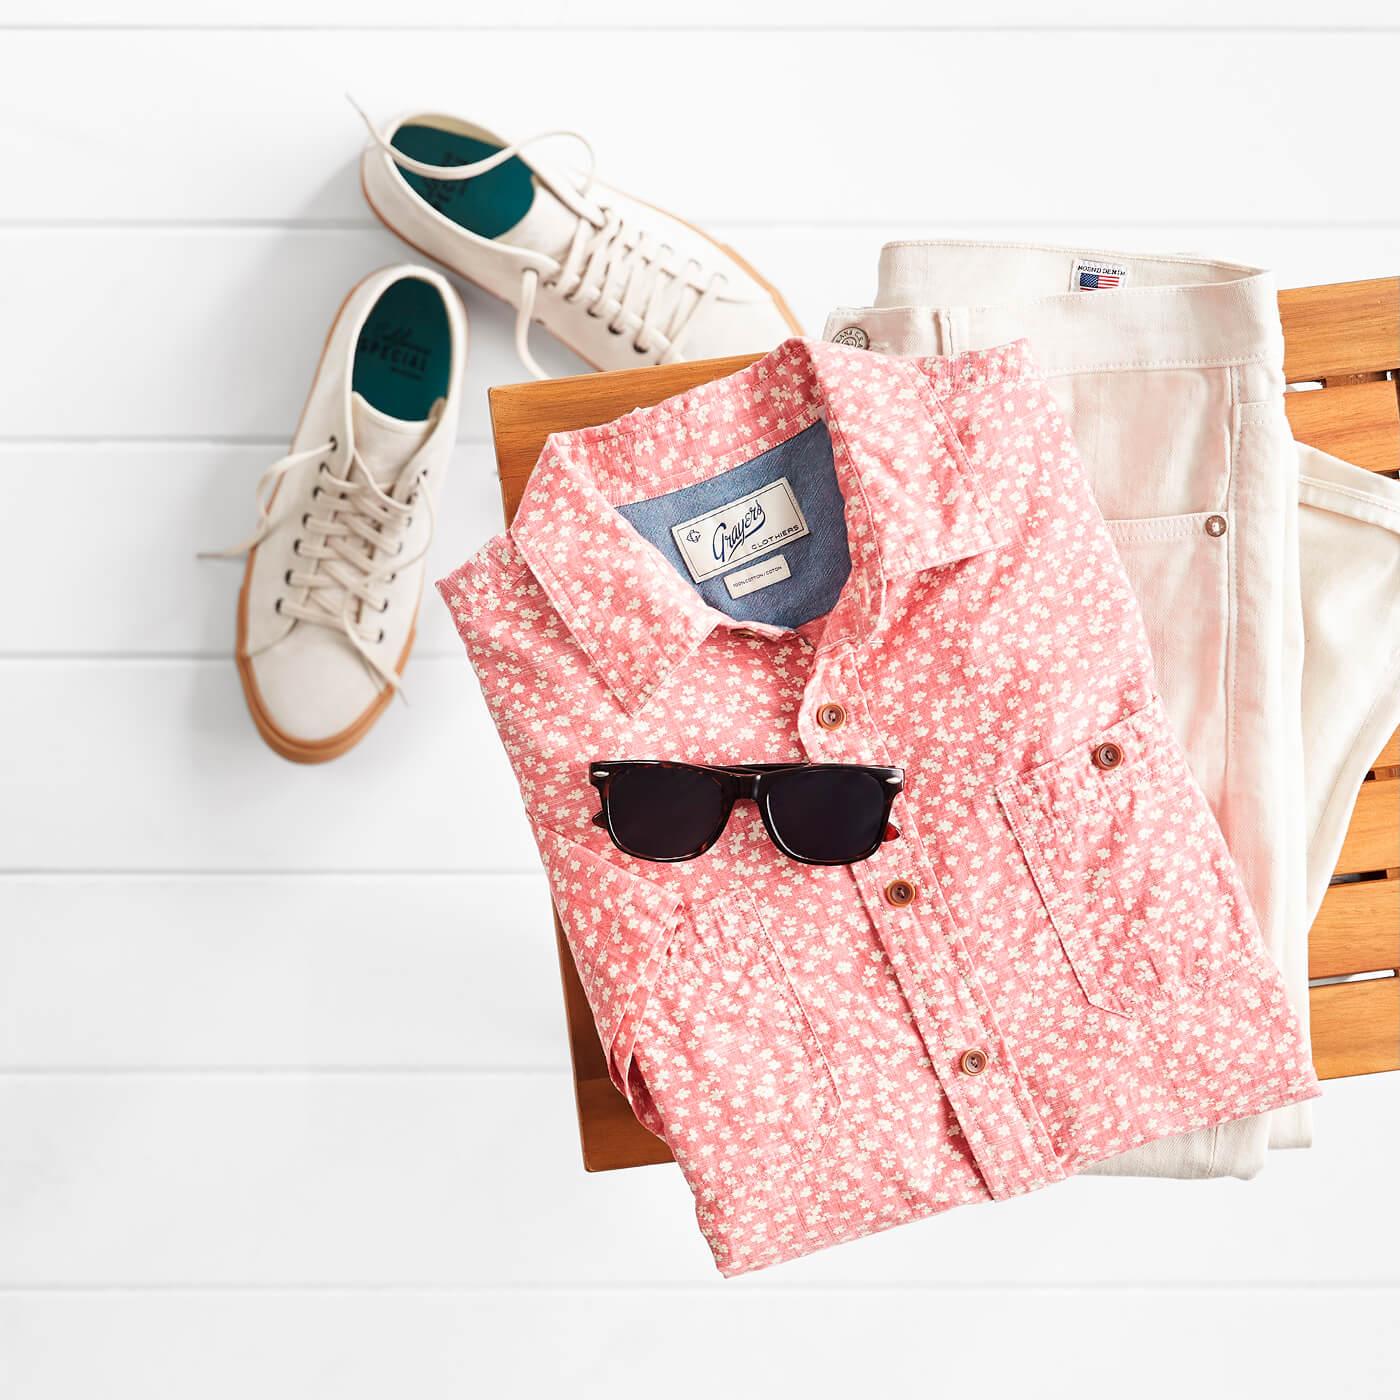 pink floral printed shirt and men's khaki pants